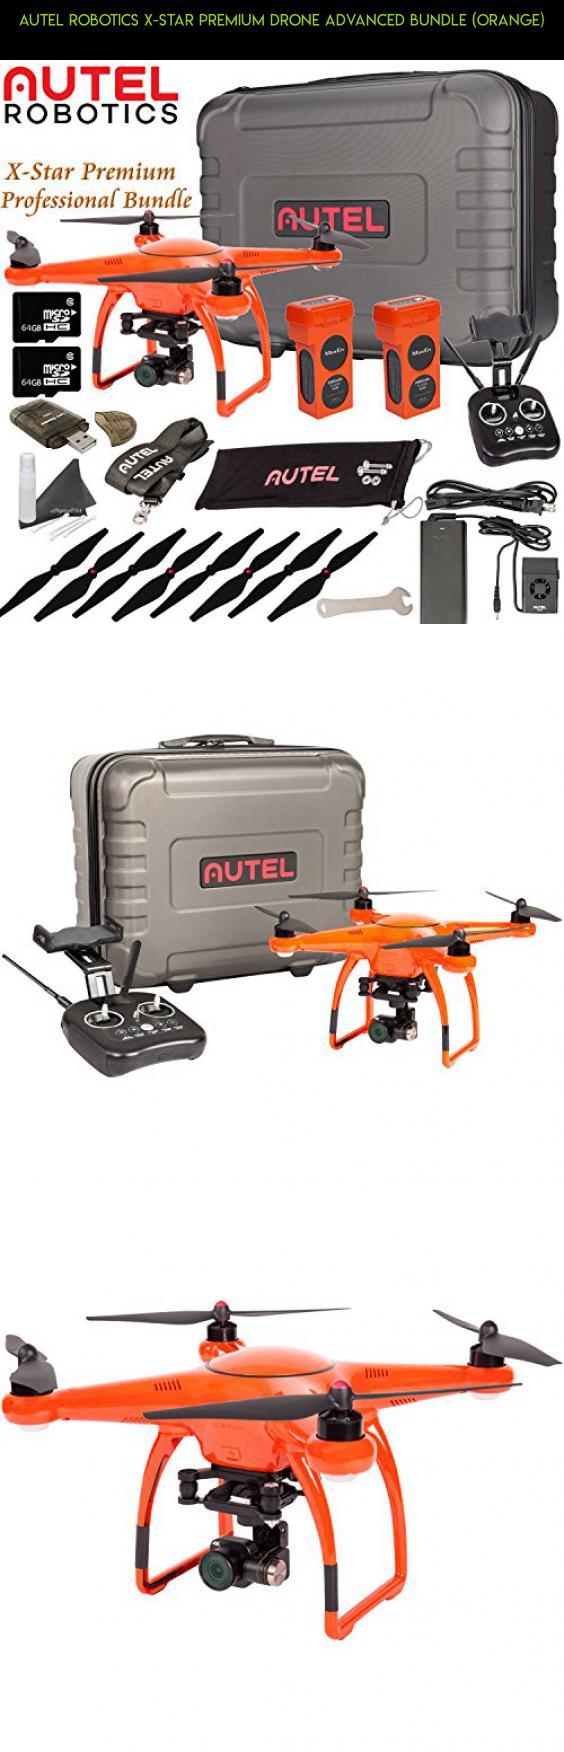 Autel Robotics X Star Premium Drone Advanced Bundle Orange Shopping Autel Parts Tech Kit Robotics Produc Drone With Hd Camera Drone Professional Drone